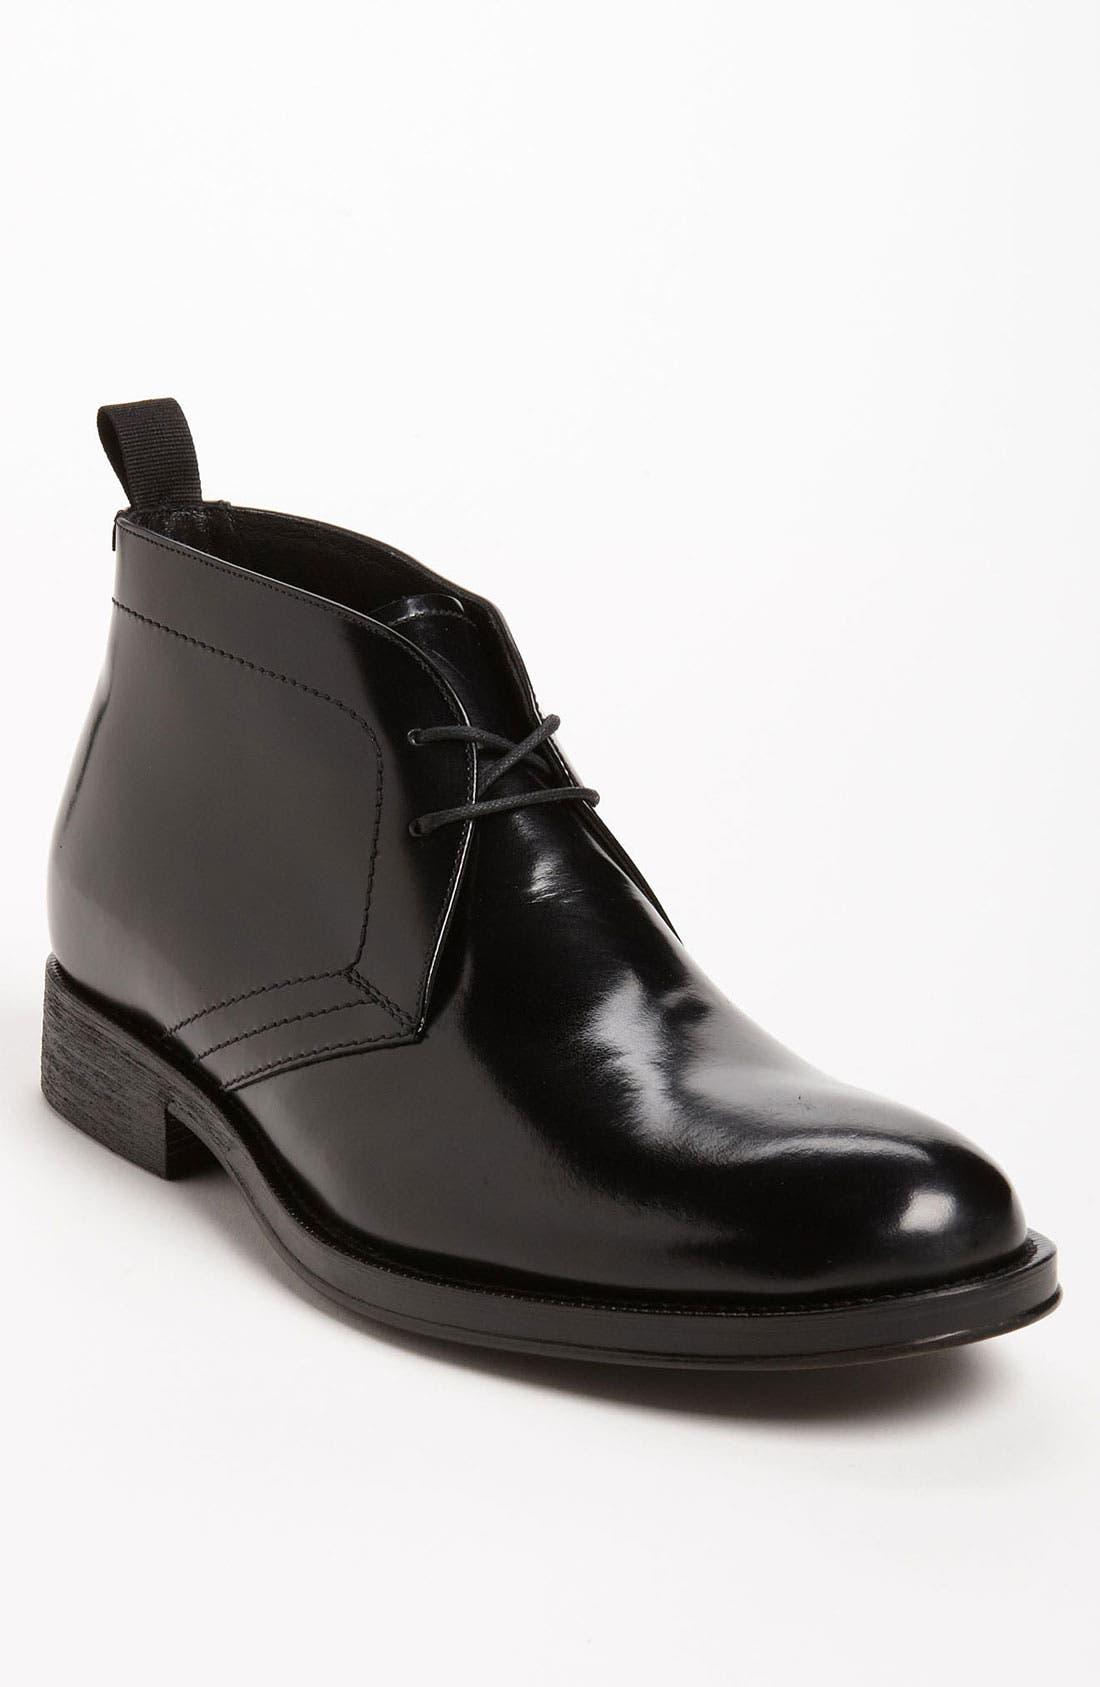 Alternate Image 1 Selected - Mr. B's for ALDO 'Nicholas' Chukka Boot